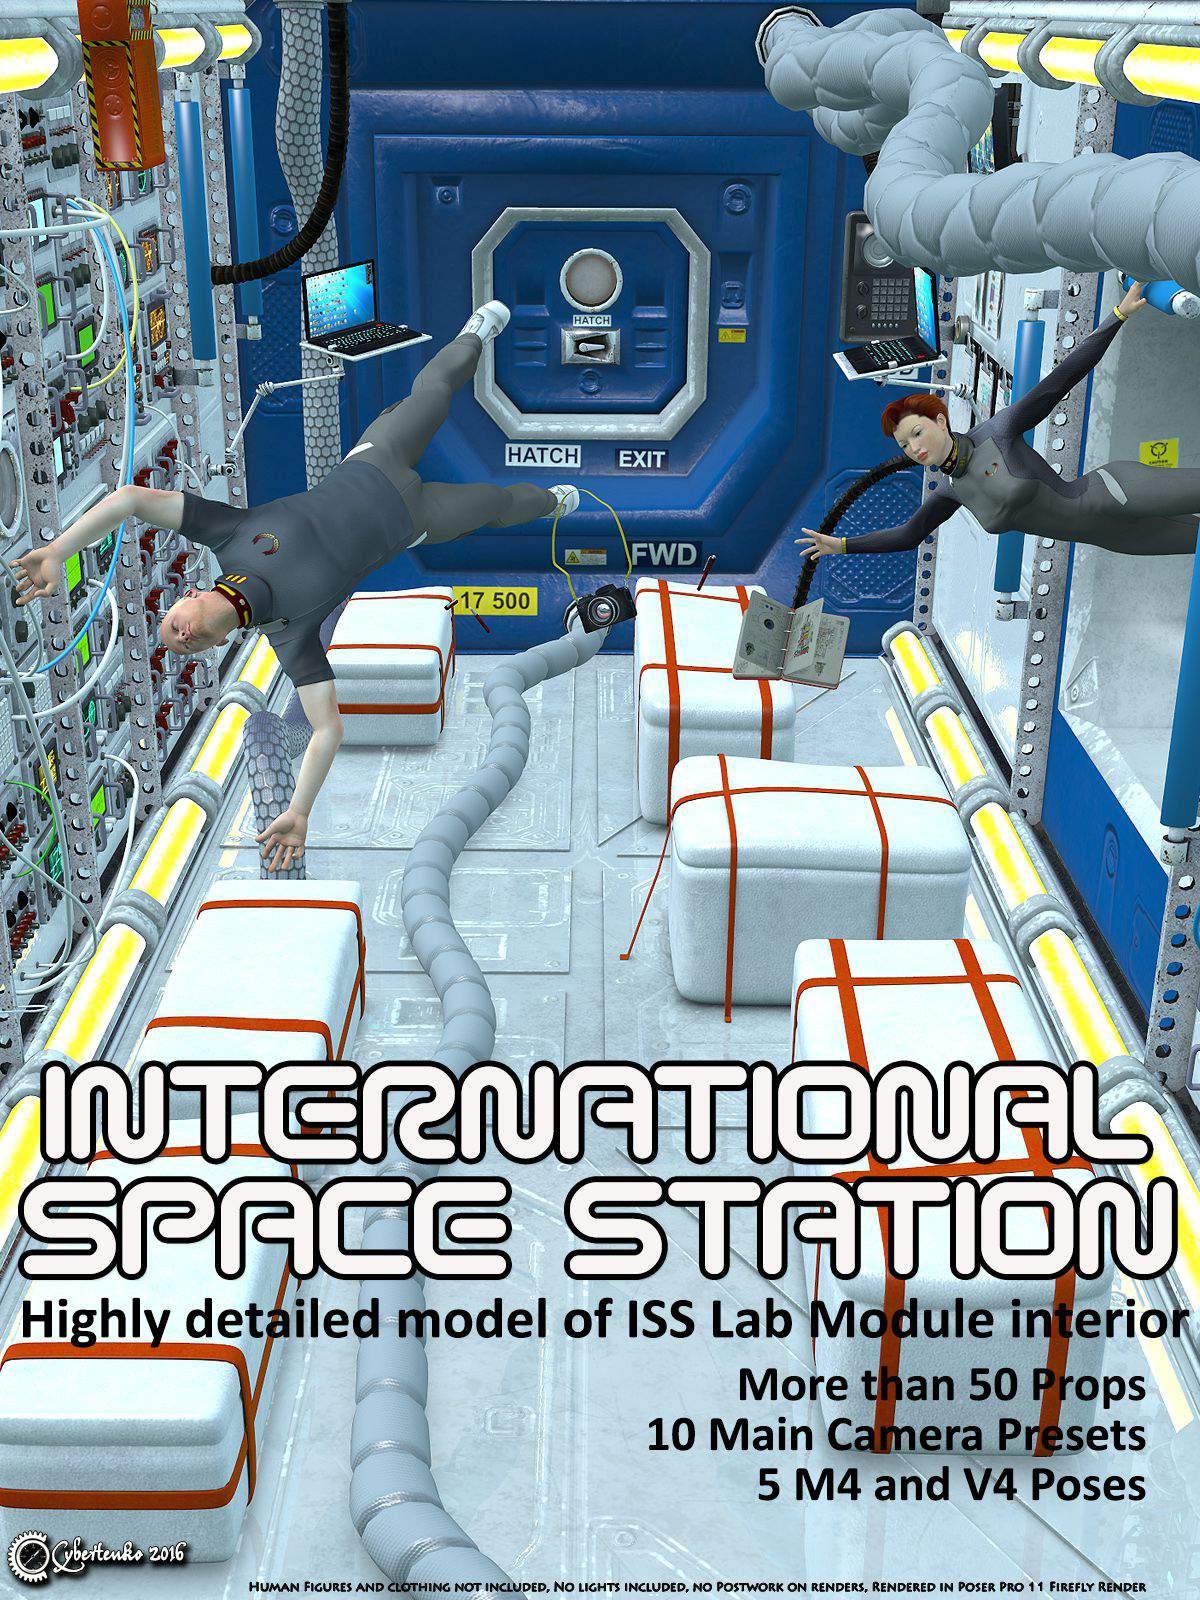 International Space Station_DAZ3D下载站